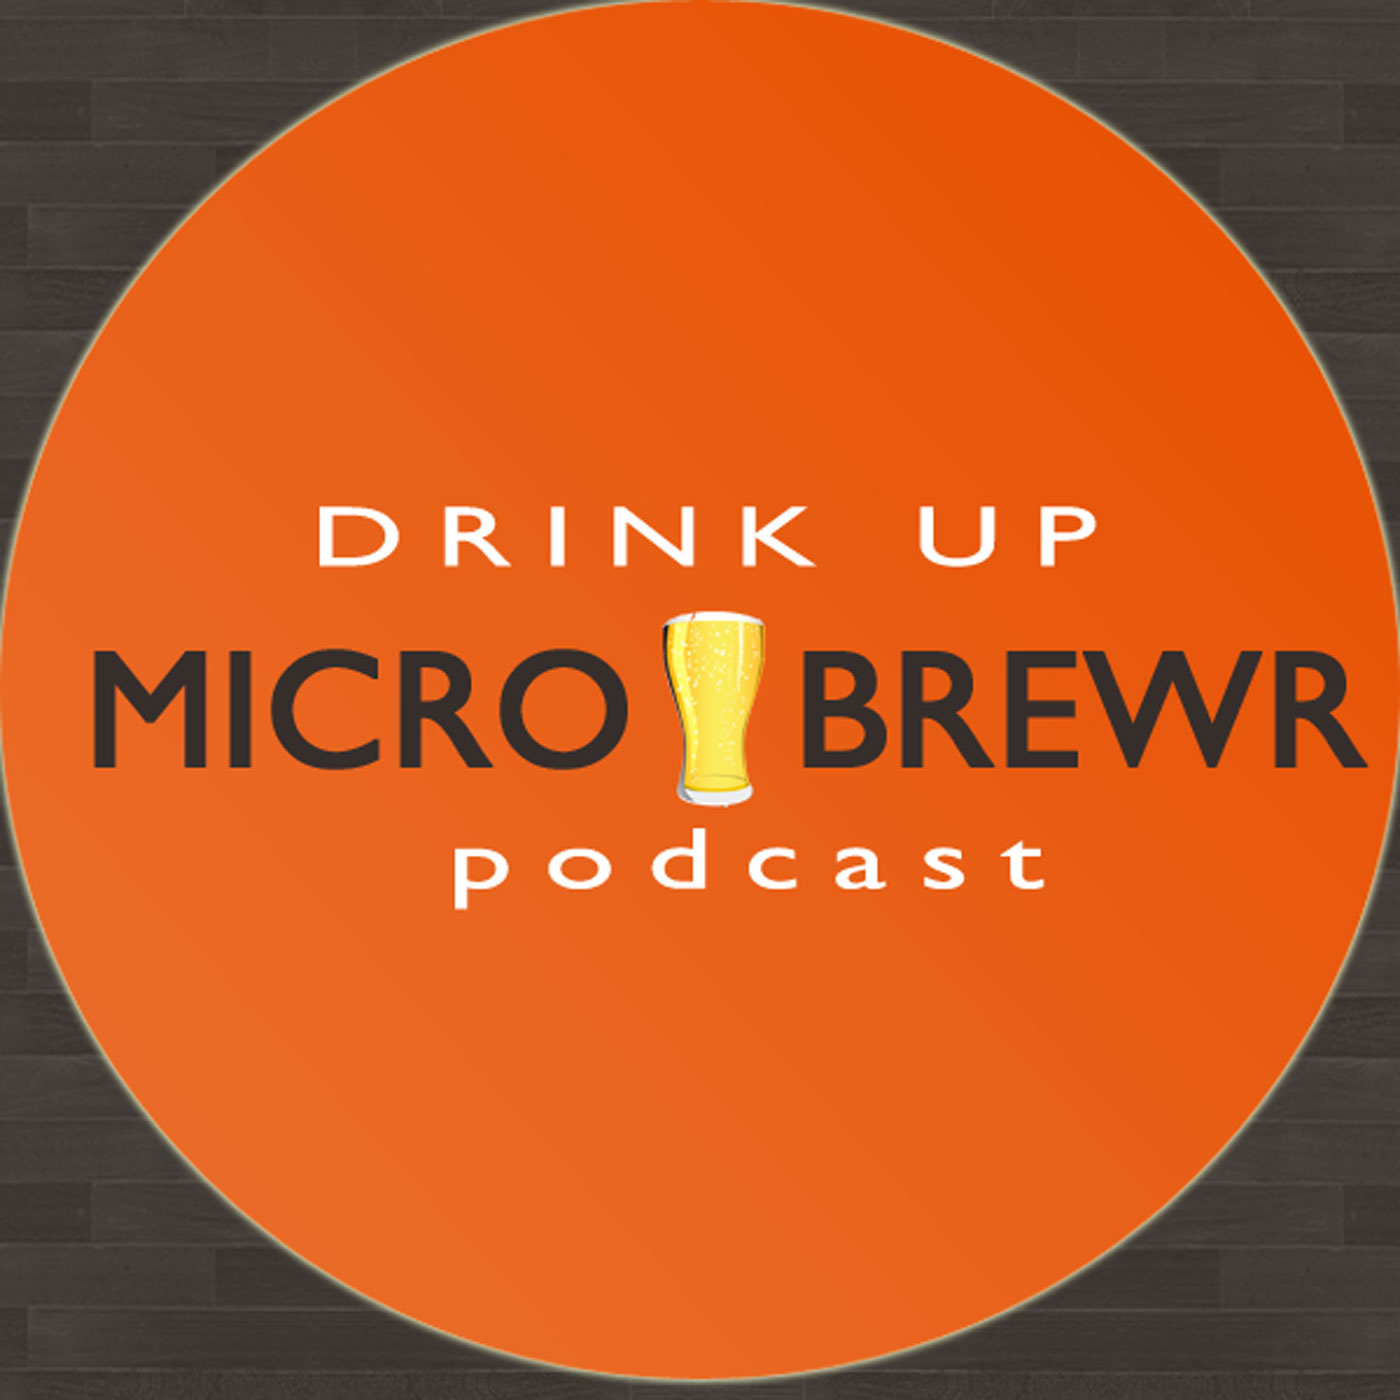 MicroBrewr Podcast